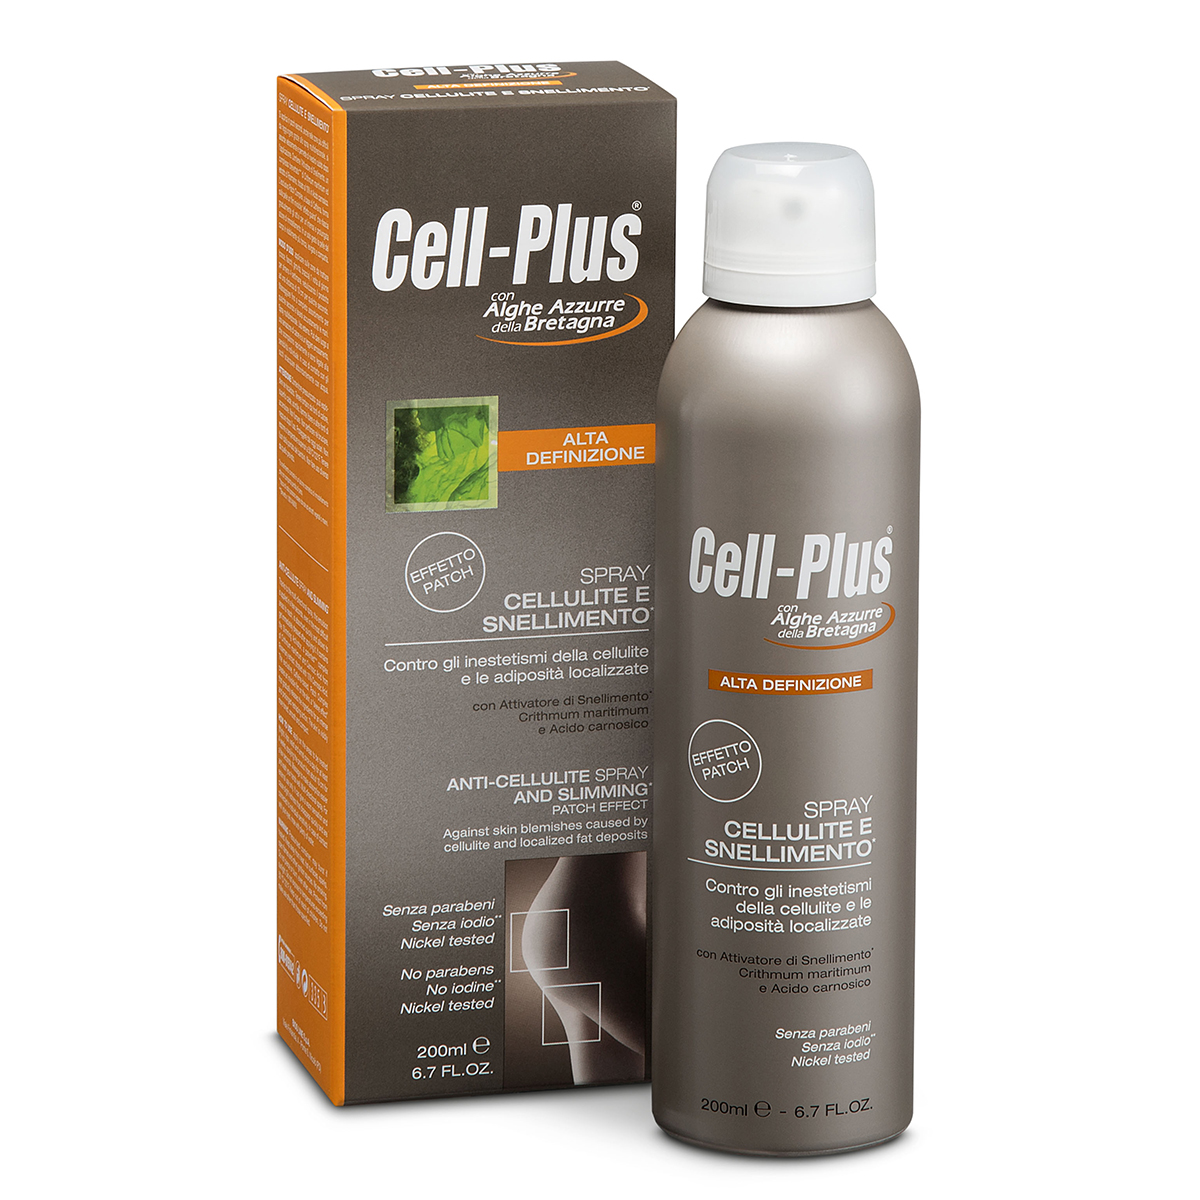 Cell-Plus Spray Cellulite e Snellimento*